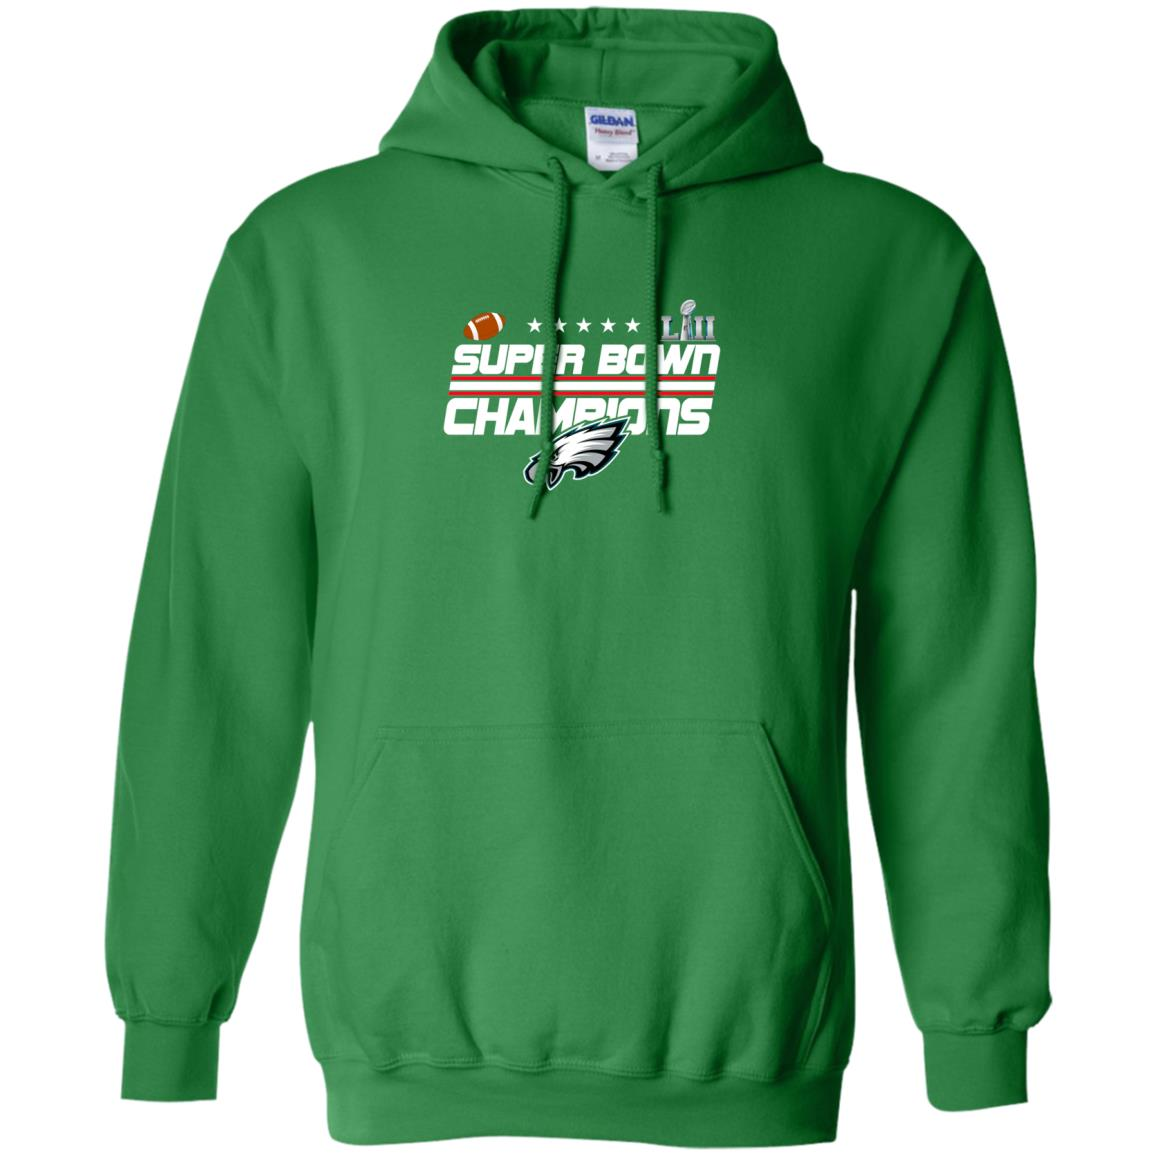 image 248 - Eagles Super Bowl Champions Shirt, Hoodie, Sweatshirt